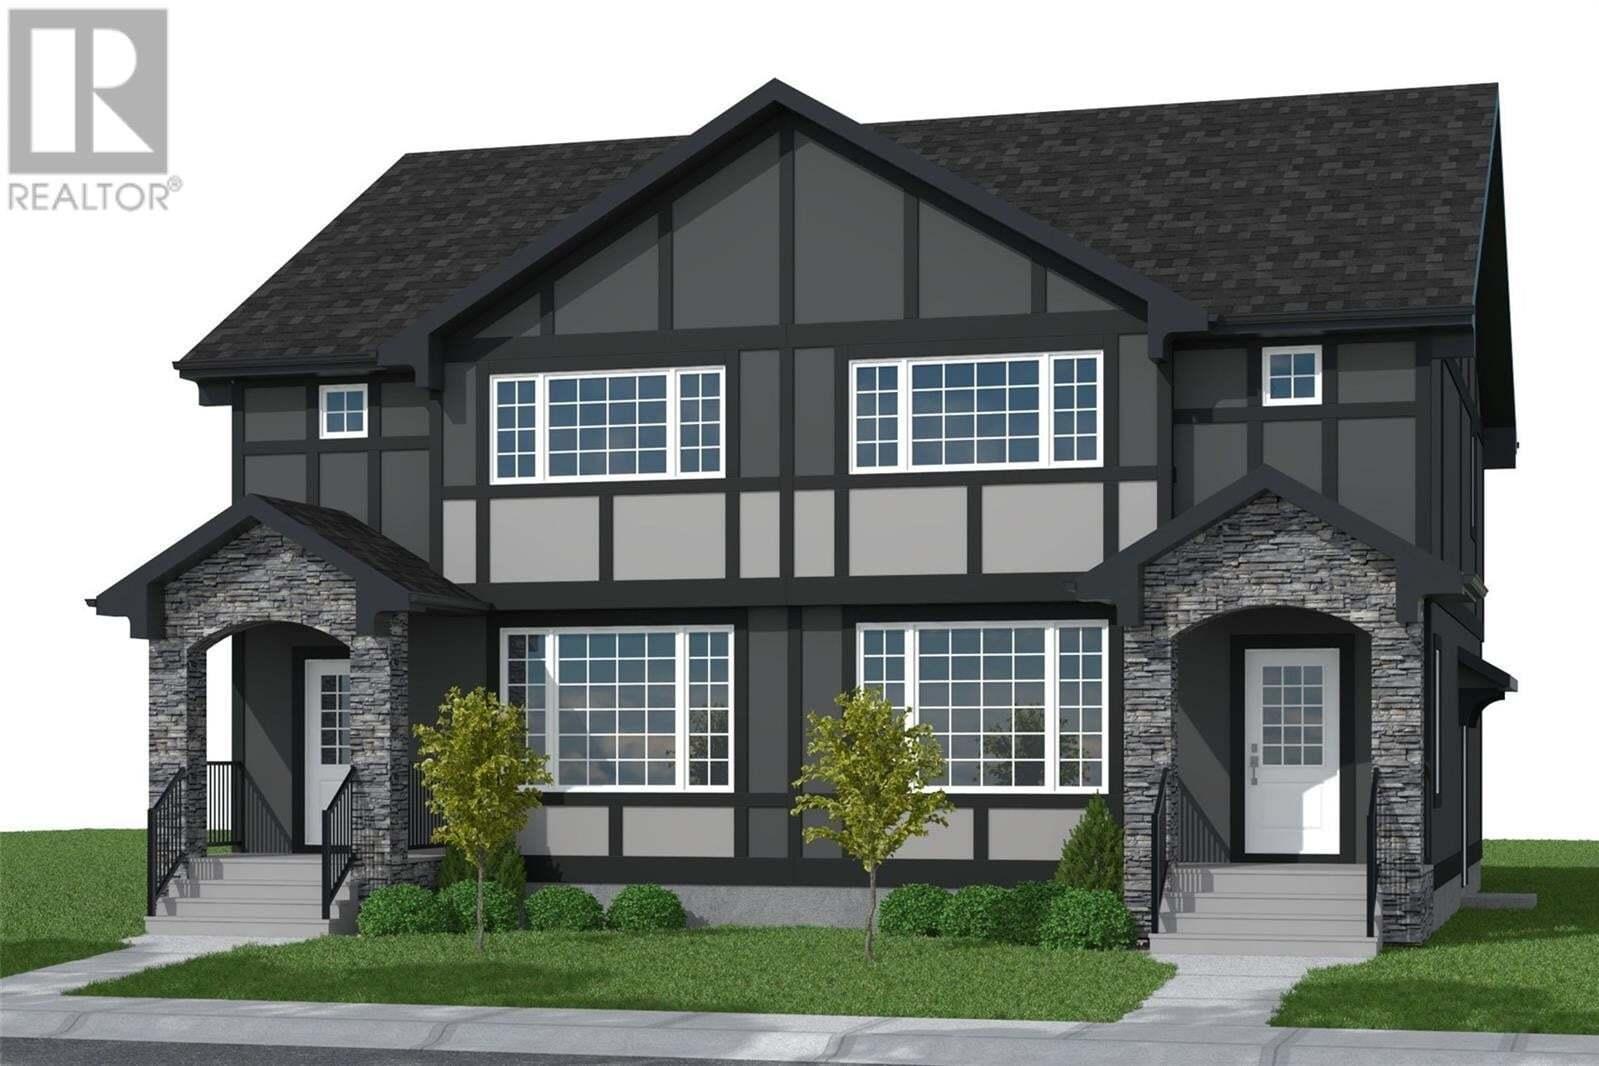 House for sale at 851 Mcfaull Ri Saskatoon Saskatchewan - MLS: SK815773